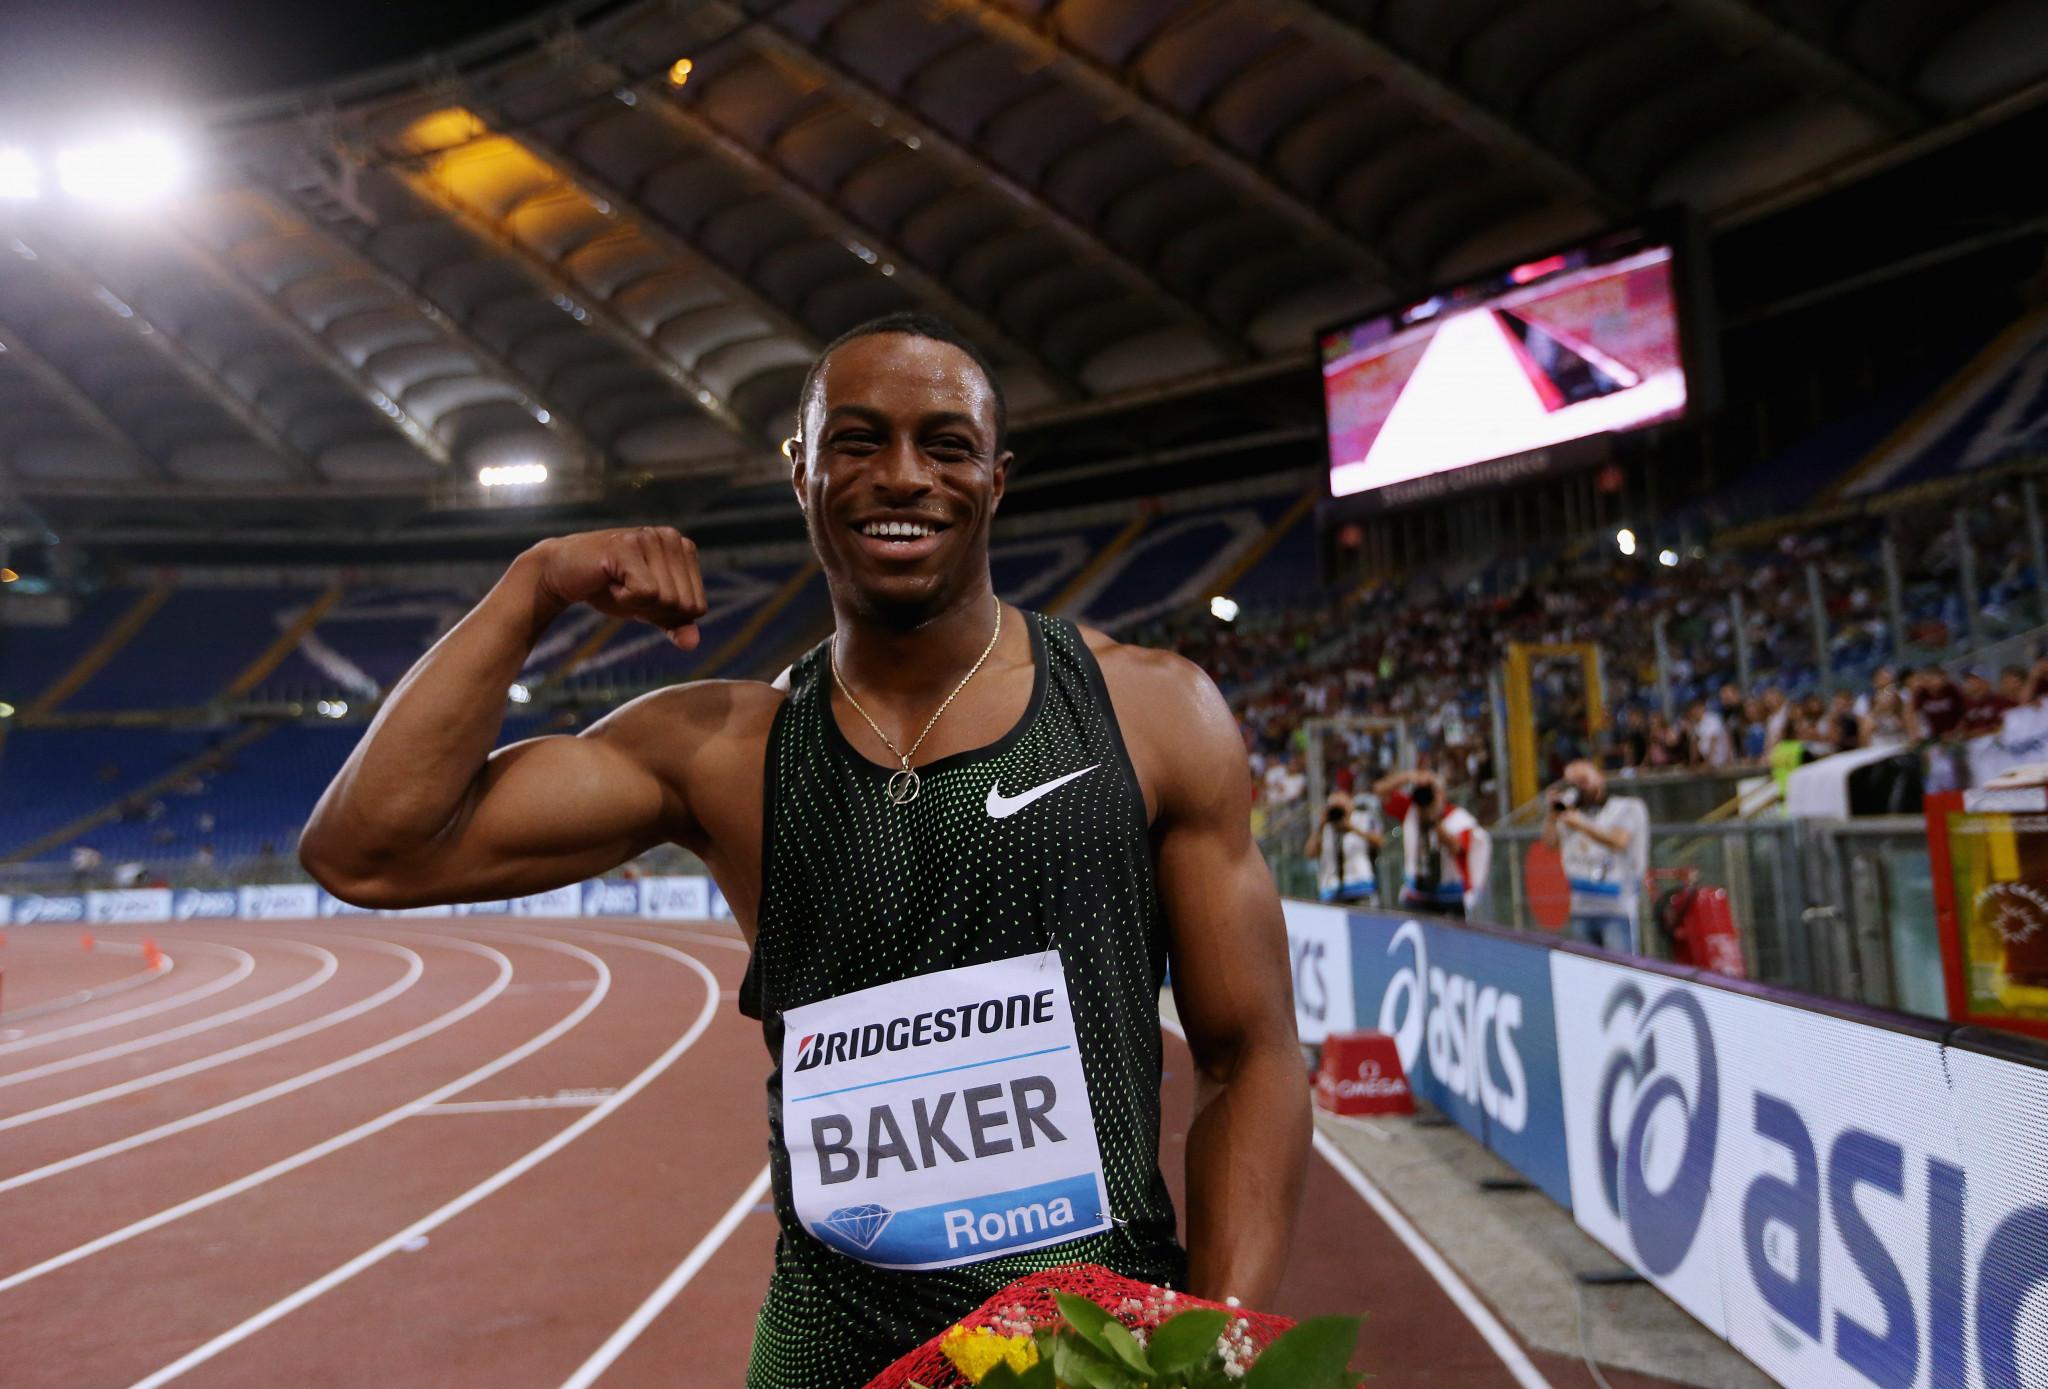 Baker earns more 100 metres glory on night of top performances in IAAF Rome Diamond League